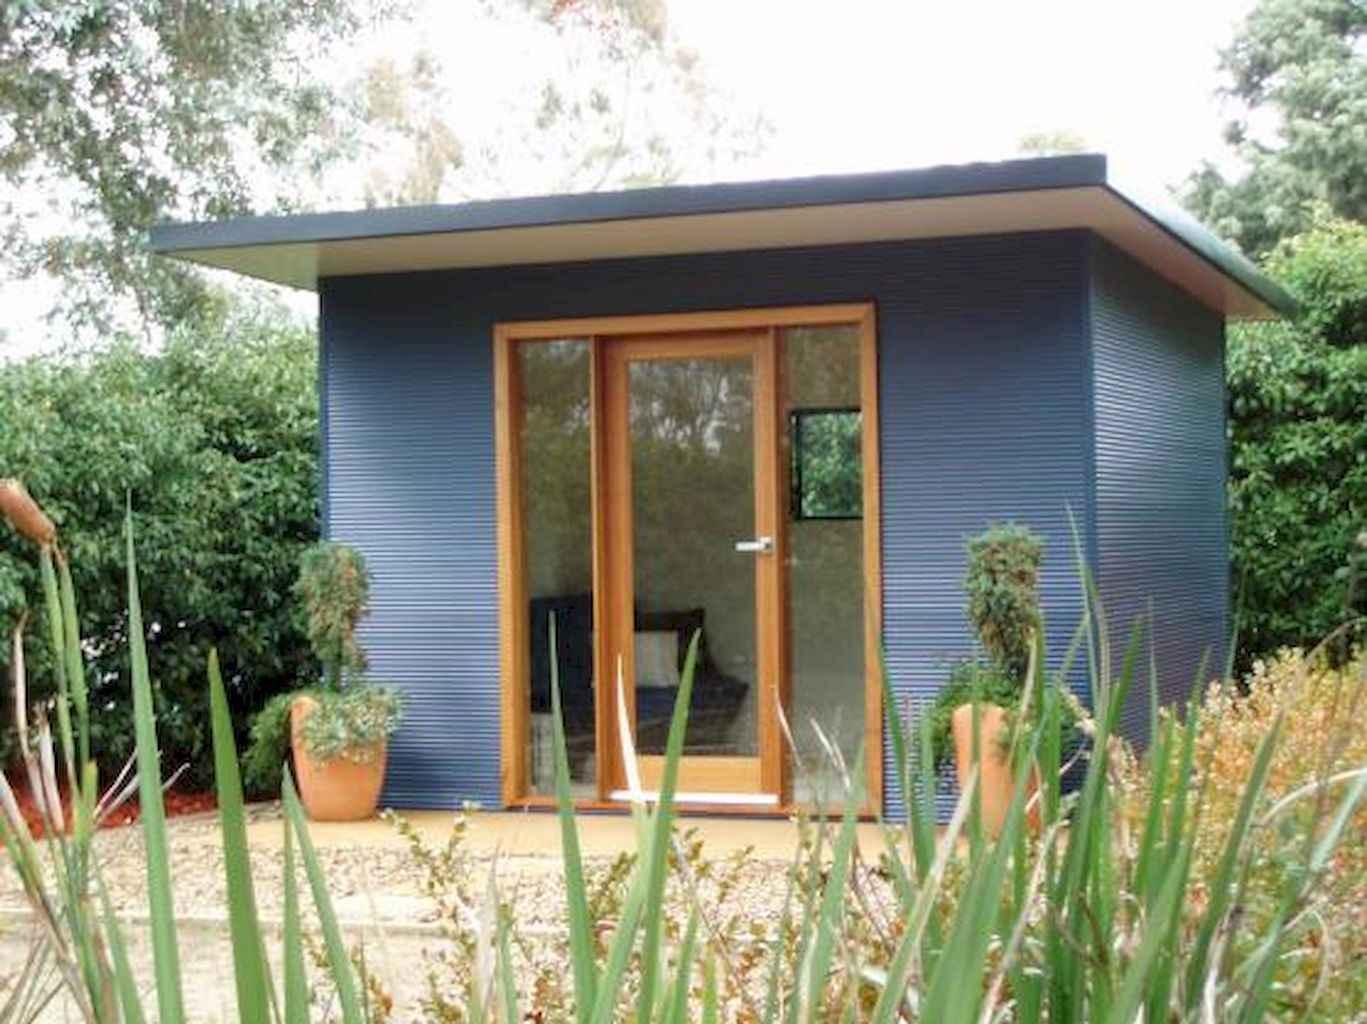 Cool diy backyard studio shed remodel design & decor ideas (6)